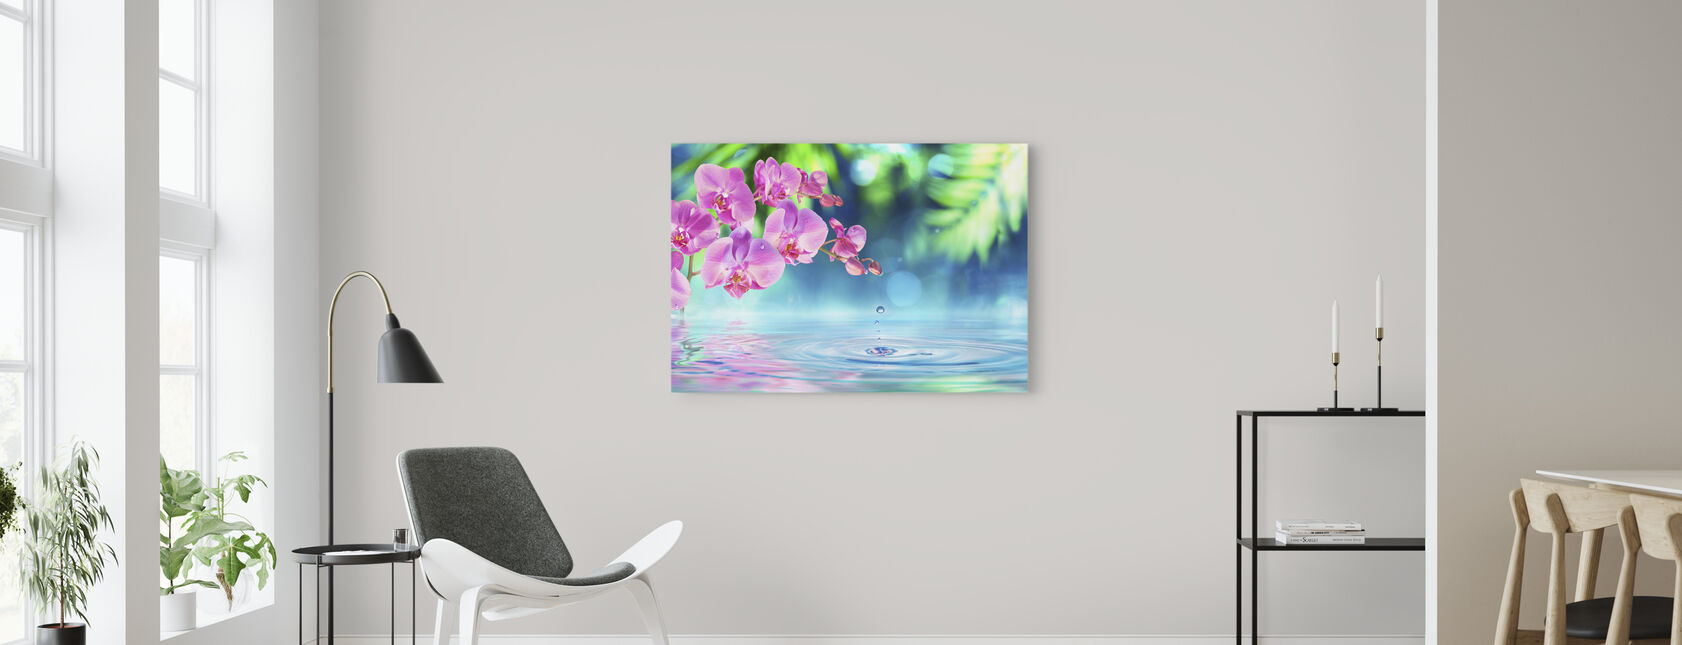 Zen Spa Orchid - Canvas print - Living Room